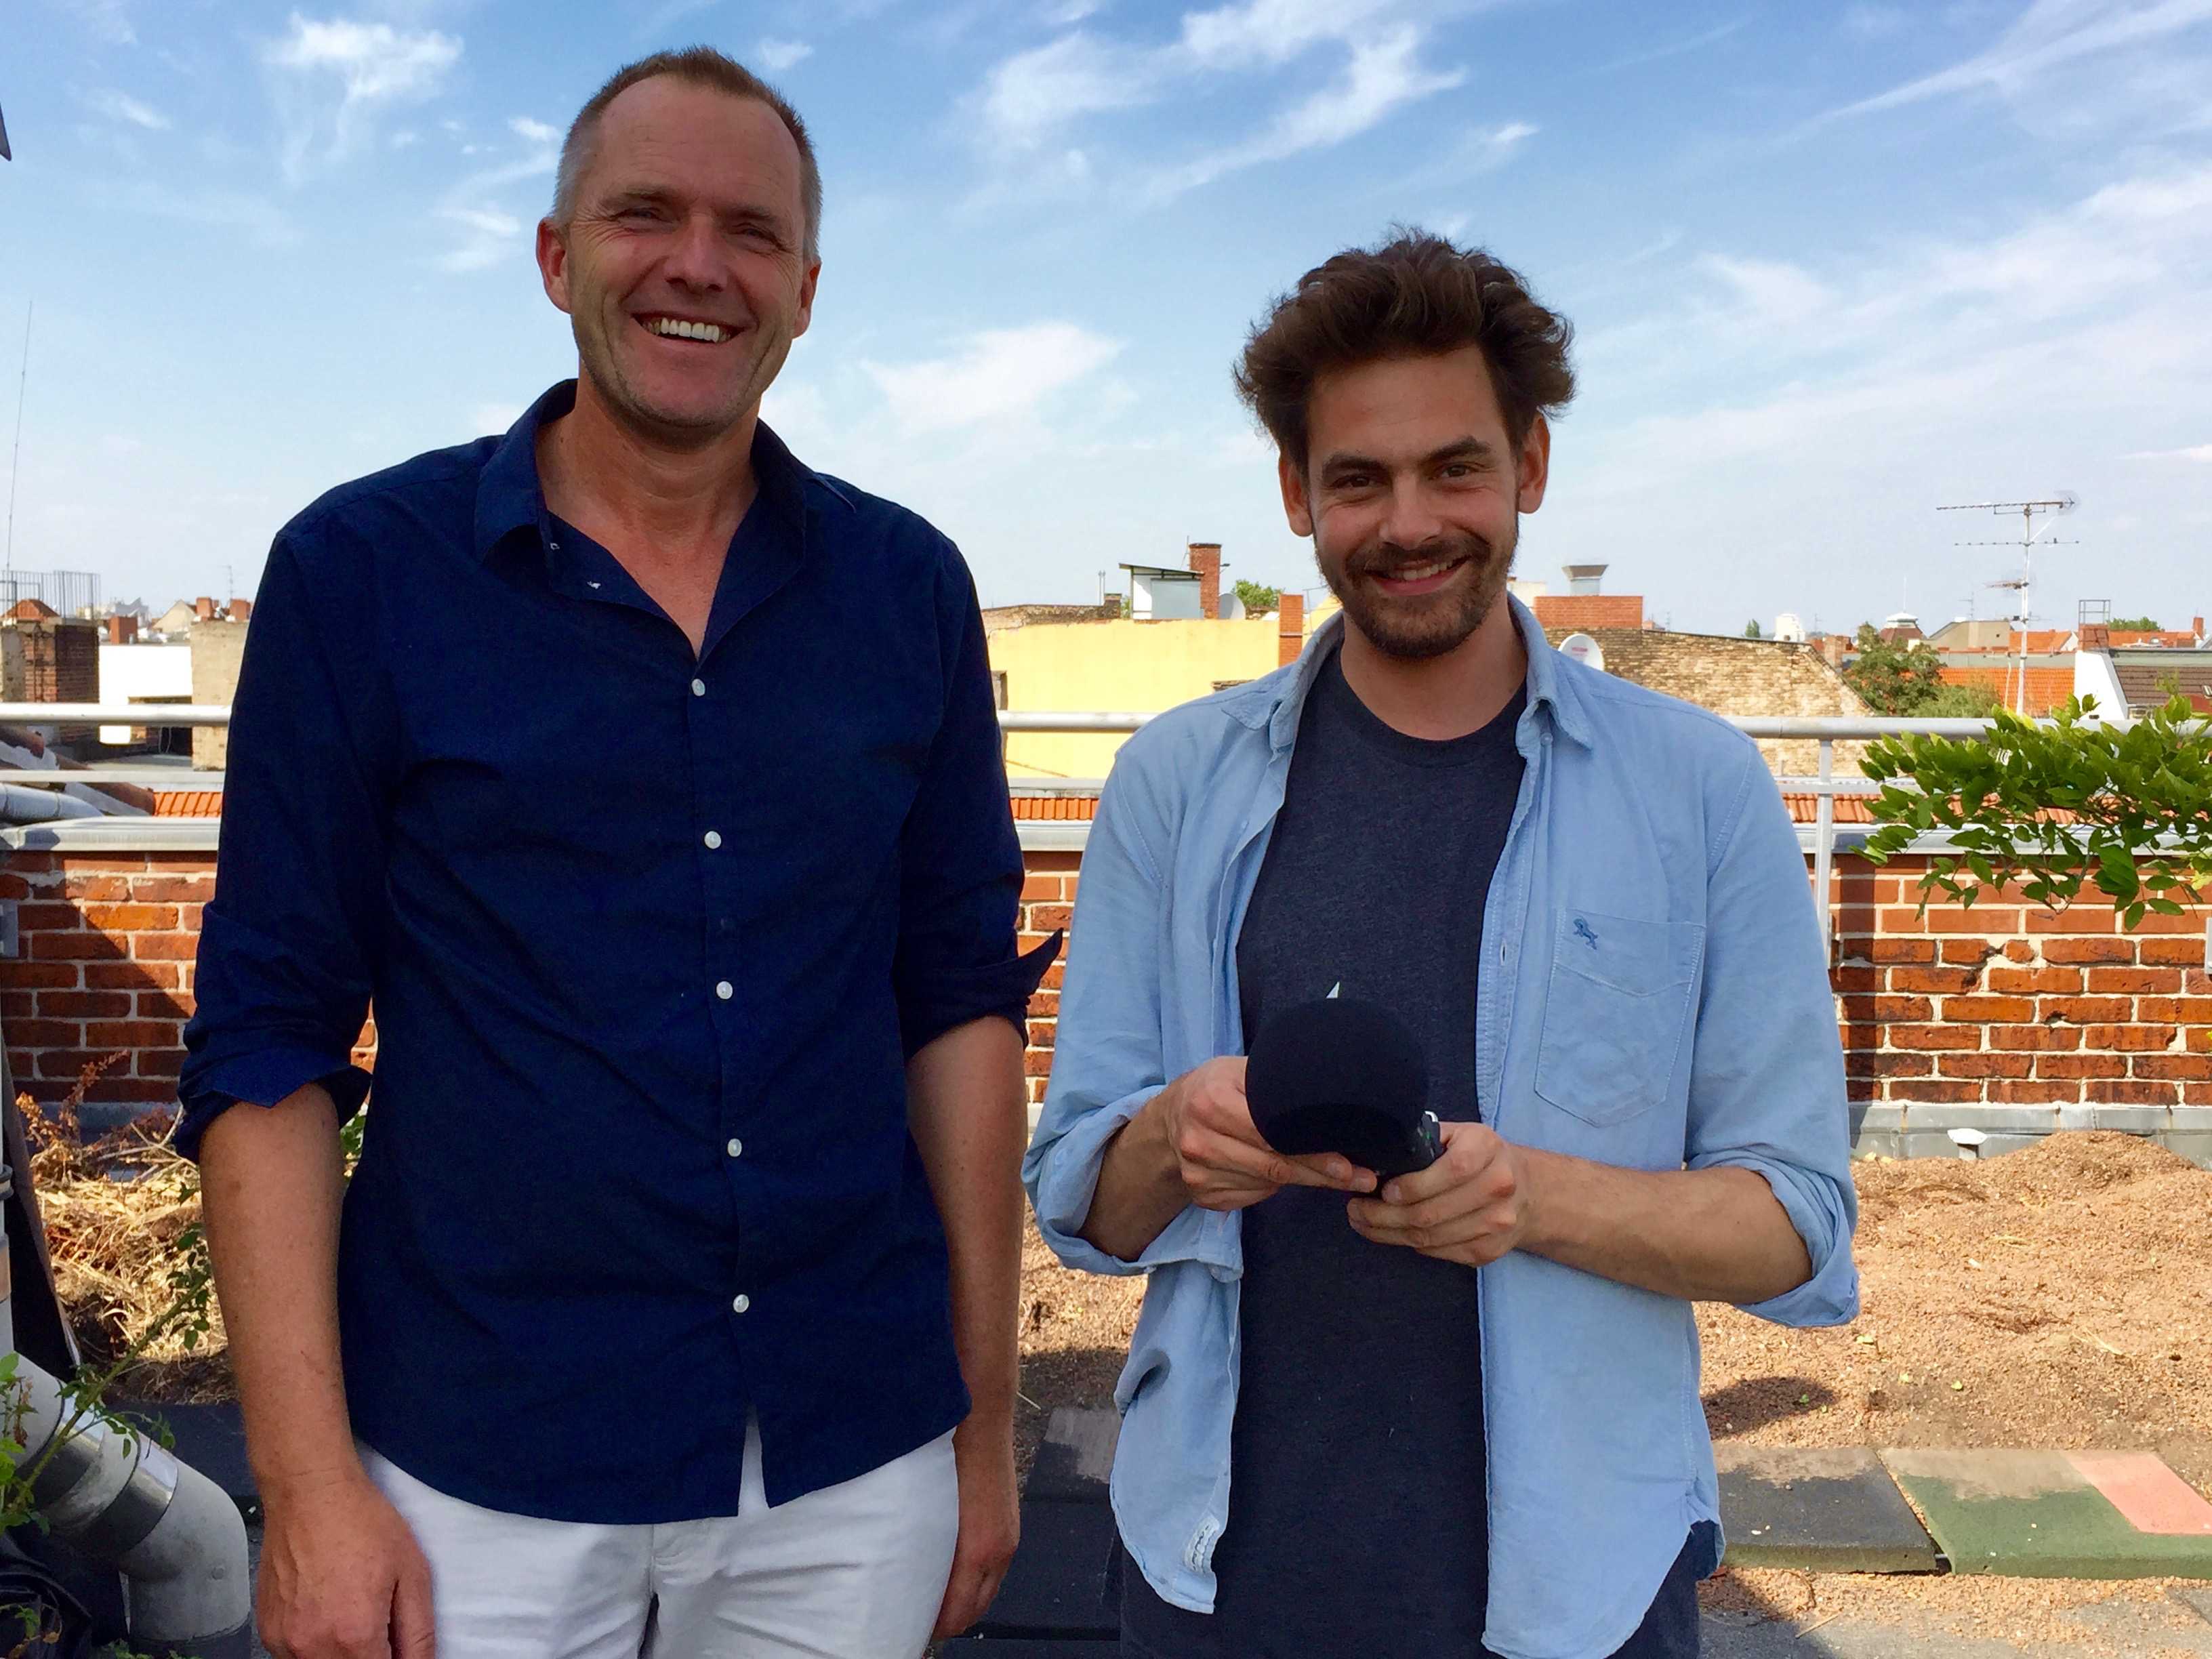 Sharehaus Refugio – Shai Hoffmann trifft Gründer Sven Lager